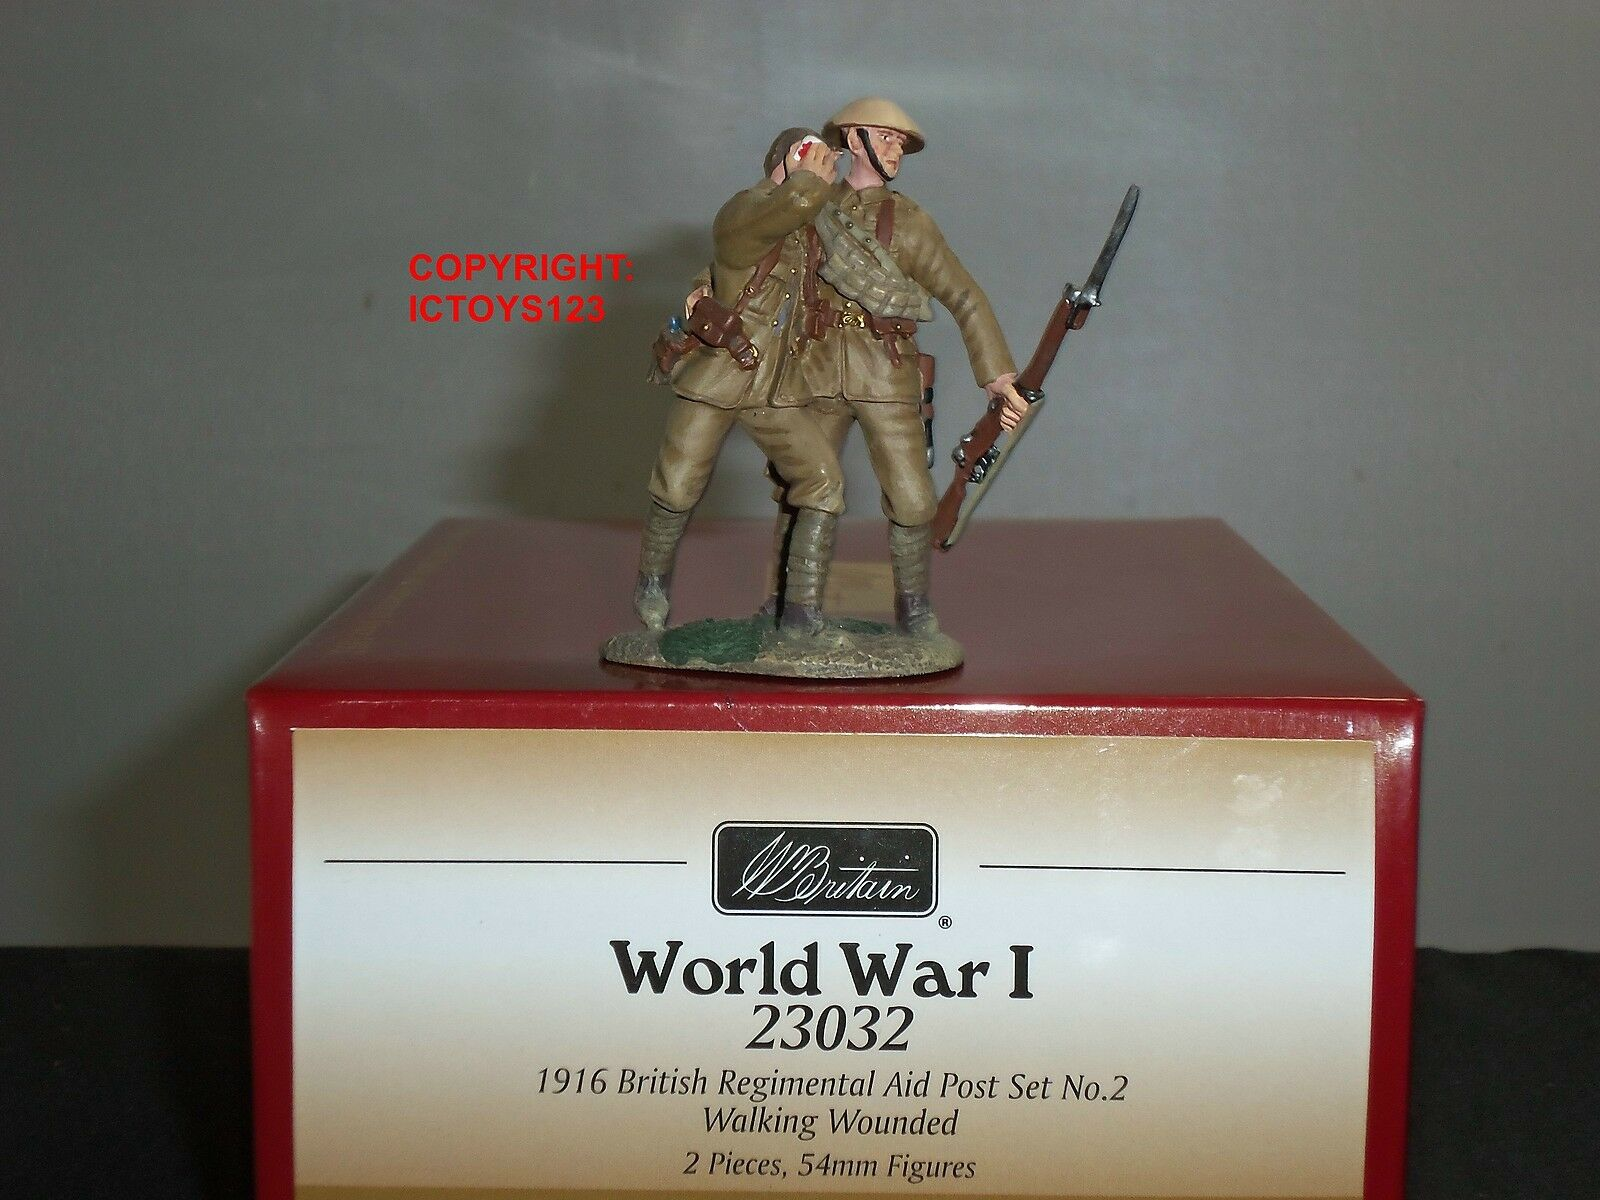 BRITAINS 23032 WORLD WAR ONE BRITISH REGIMENTAL AID POST WALKING WOUNDED SET 2